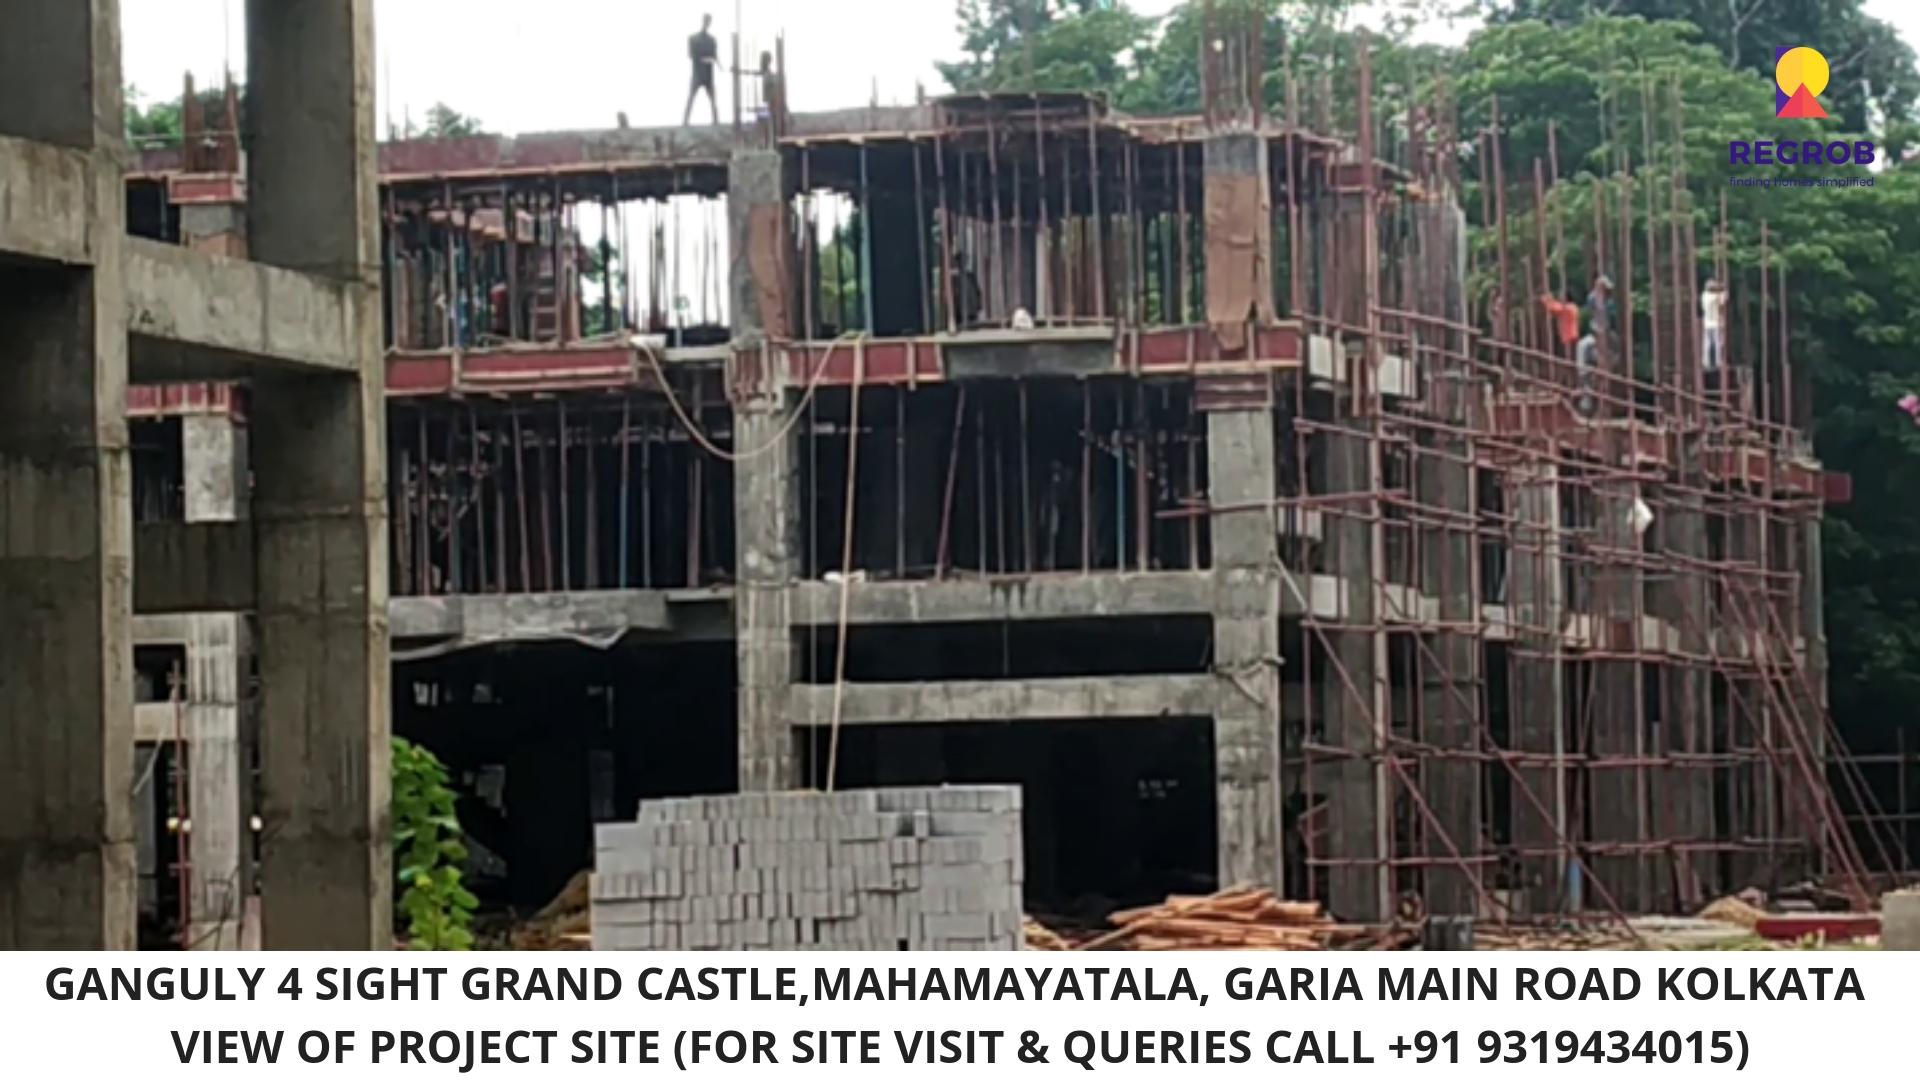 Ganguly 4 Sight Grand Castle Mahamayatala Garia Kolkata